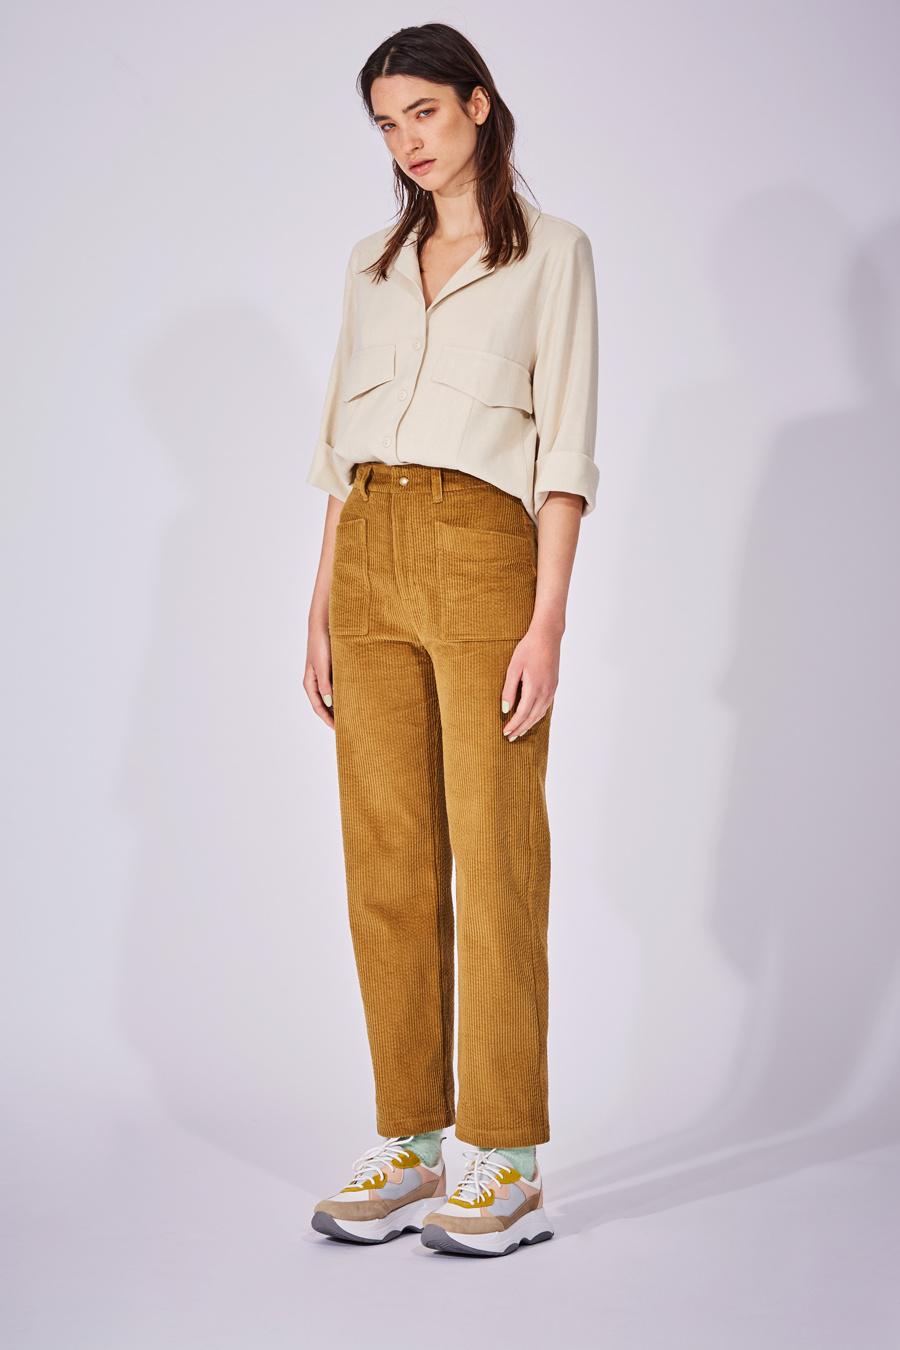 Eve Gravel Eve Gravel Fortune Teller High-Waisted Cotton Corduroy Pants